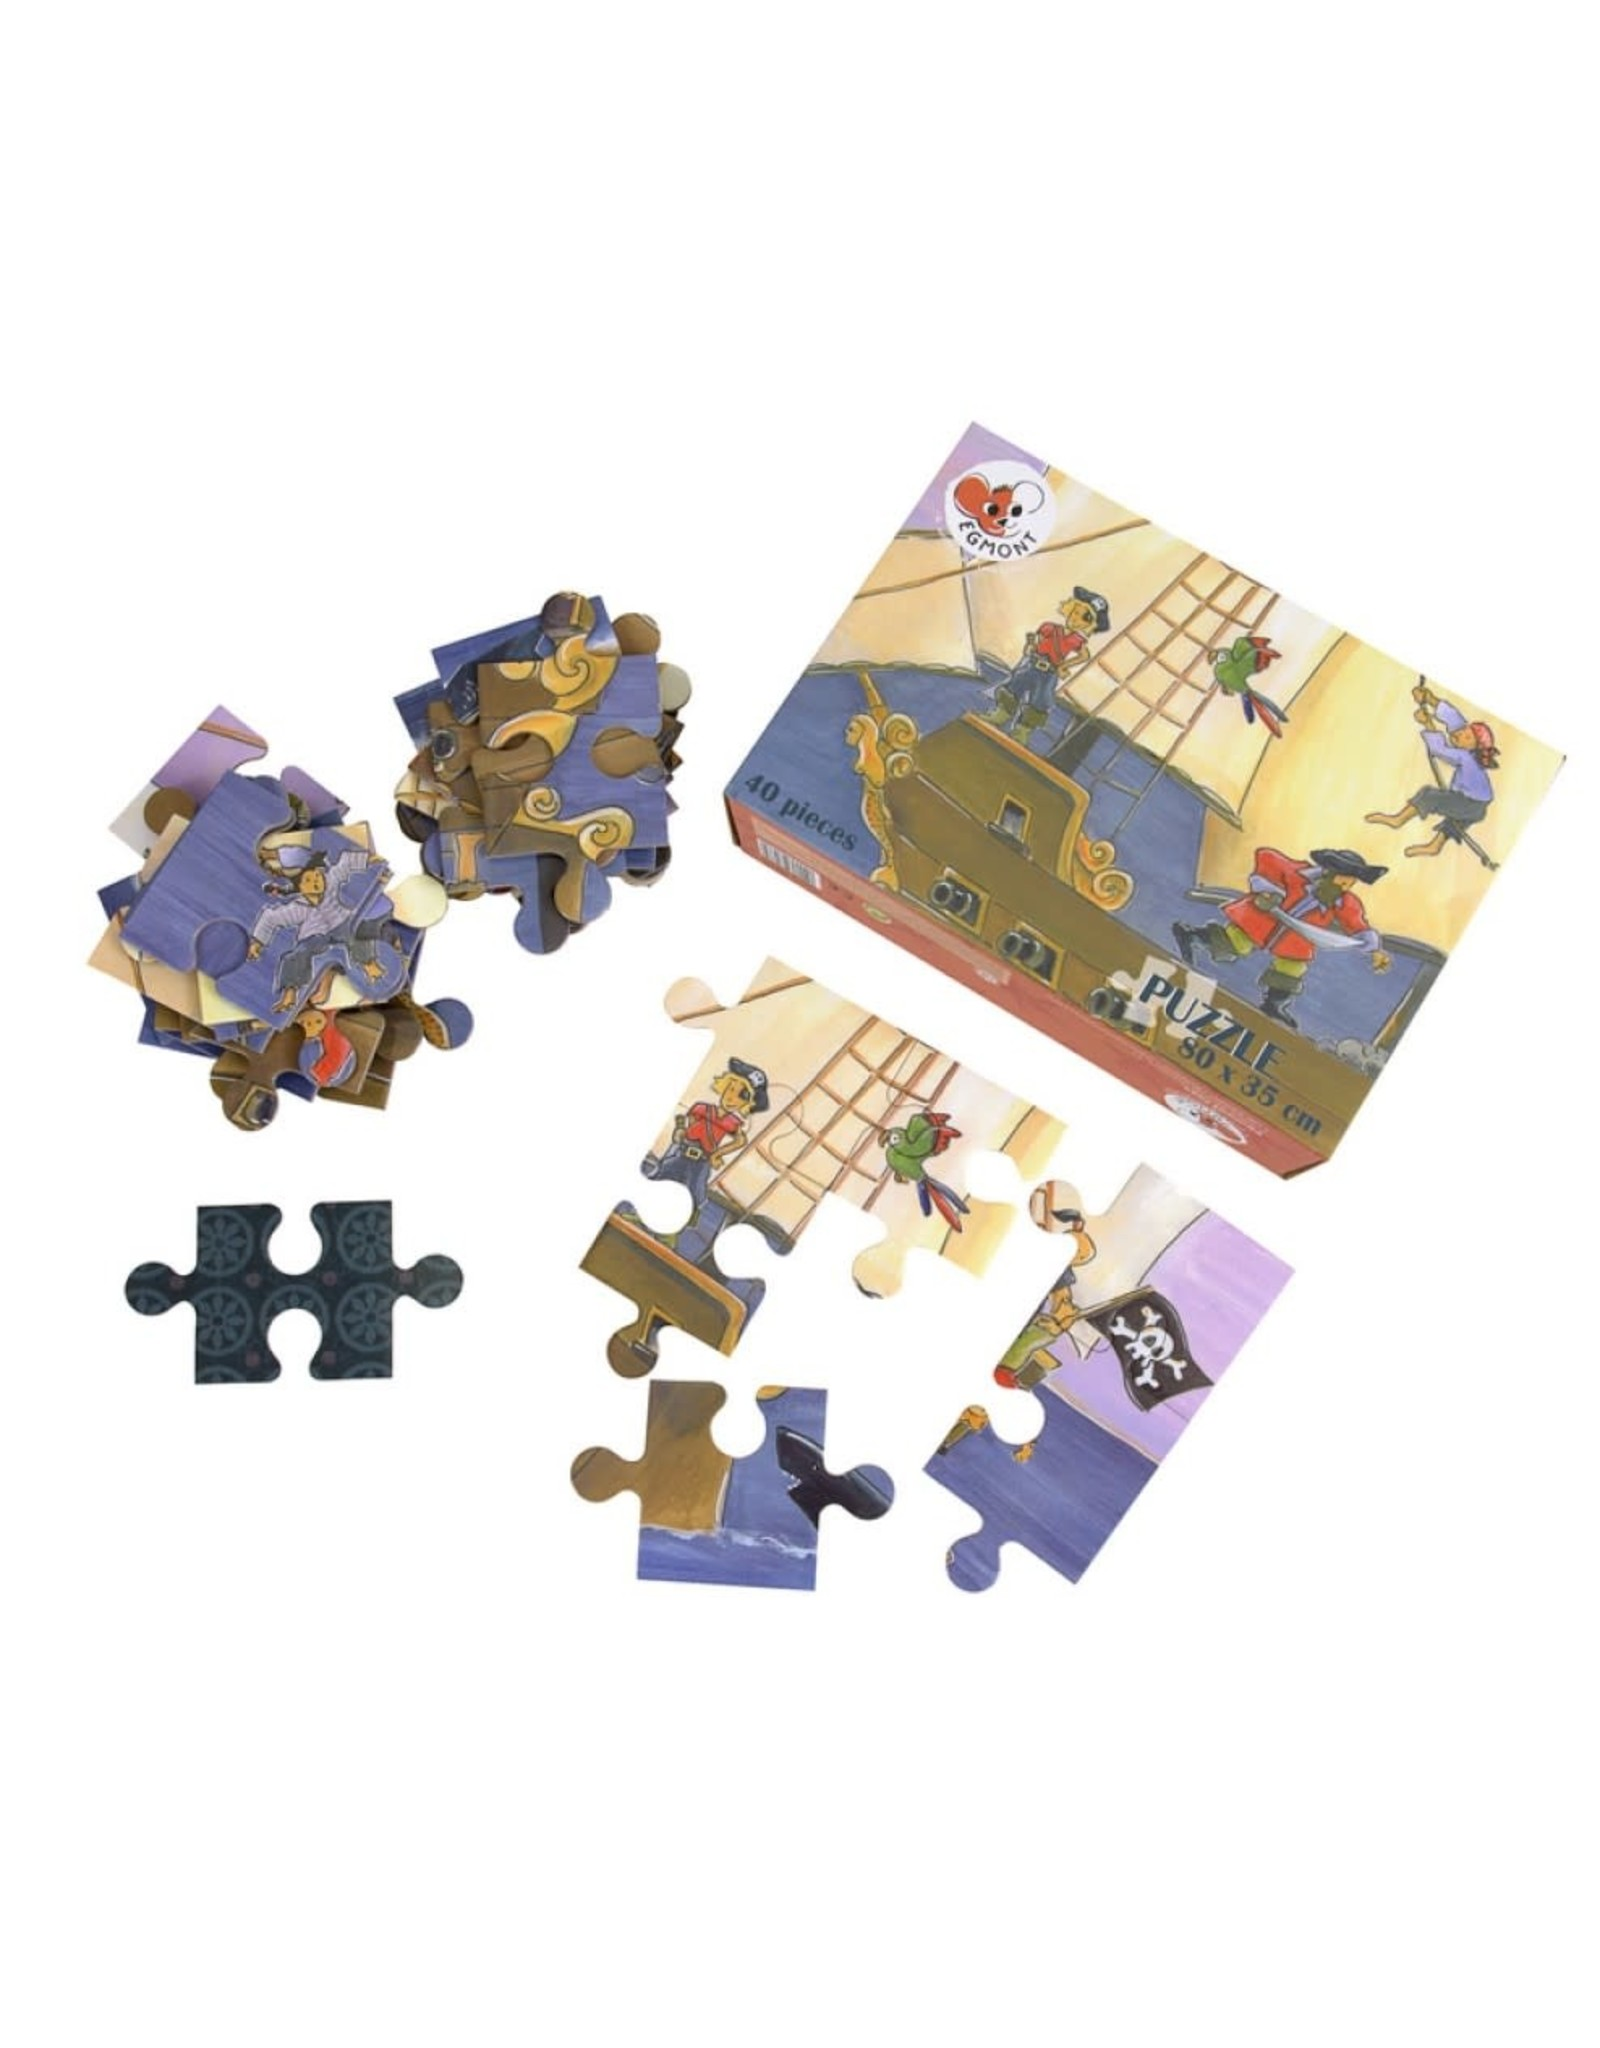 6 Floor Puzzle 40 pcs in a case Pirate